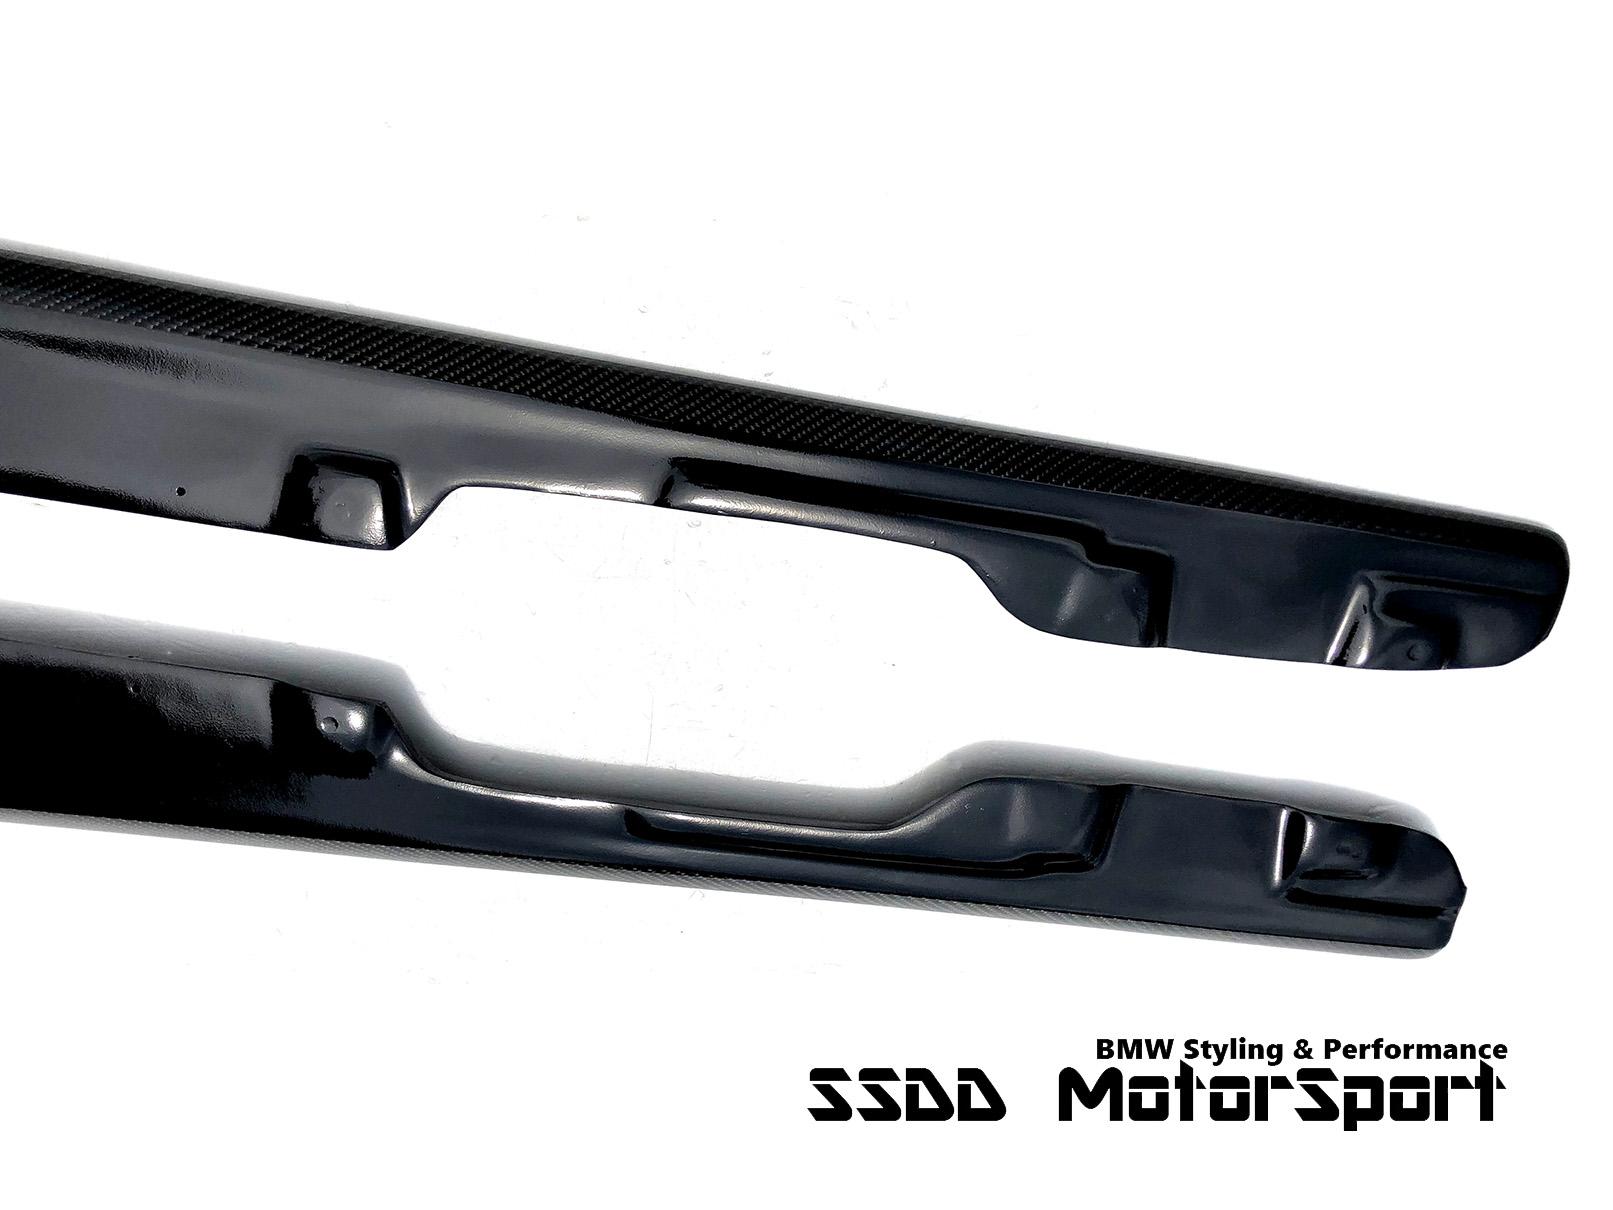 bmw-f12-f13-msport-m6-carbon-fibre-side-skirt-extensions-1.jpg